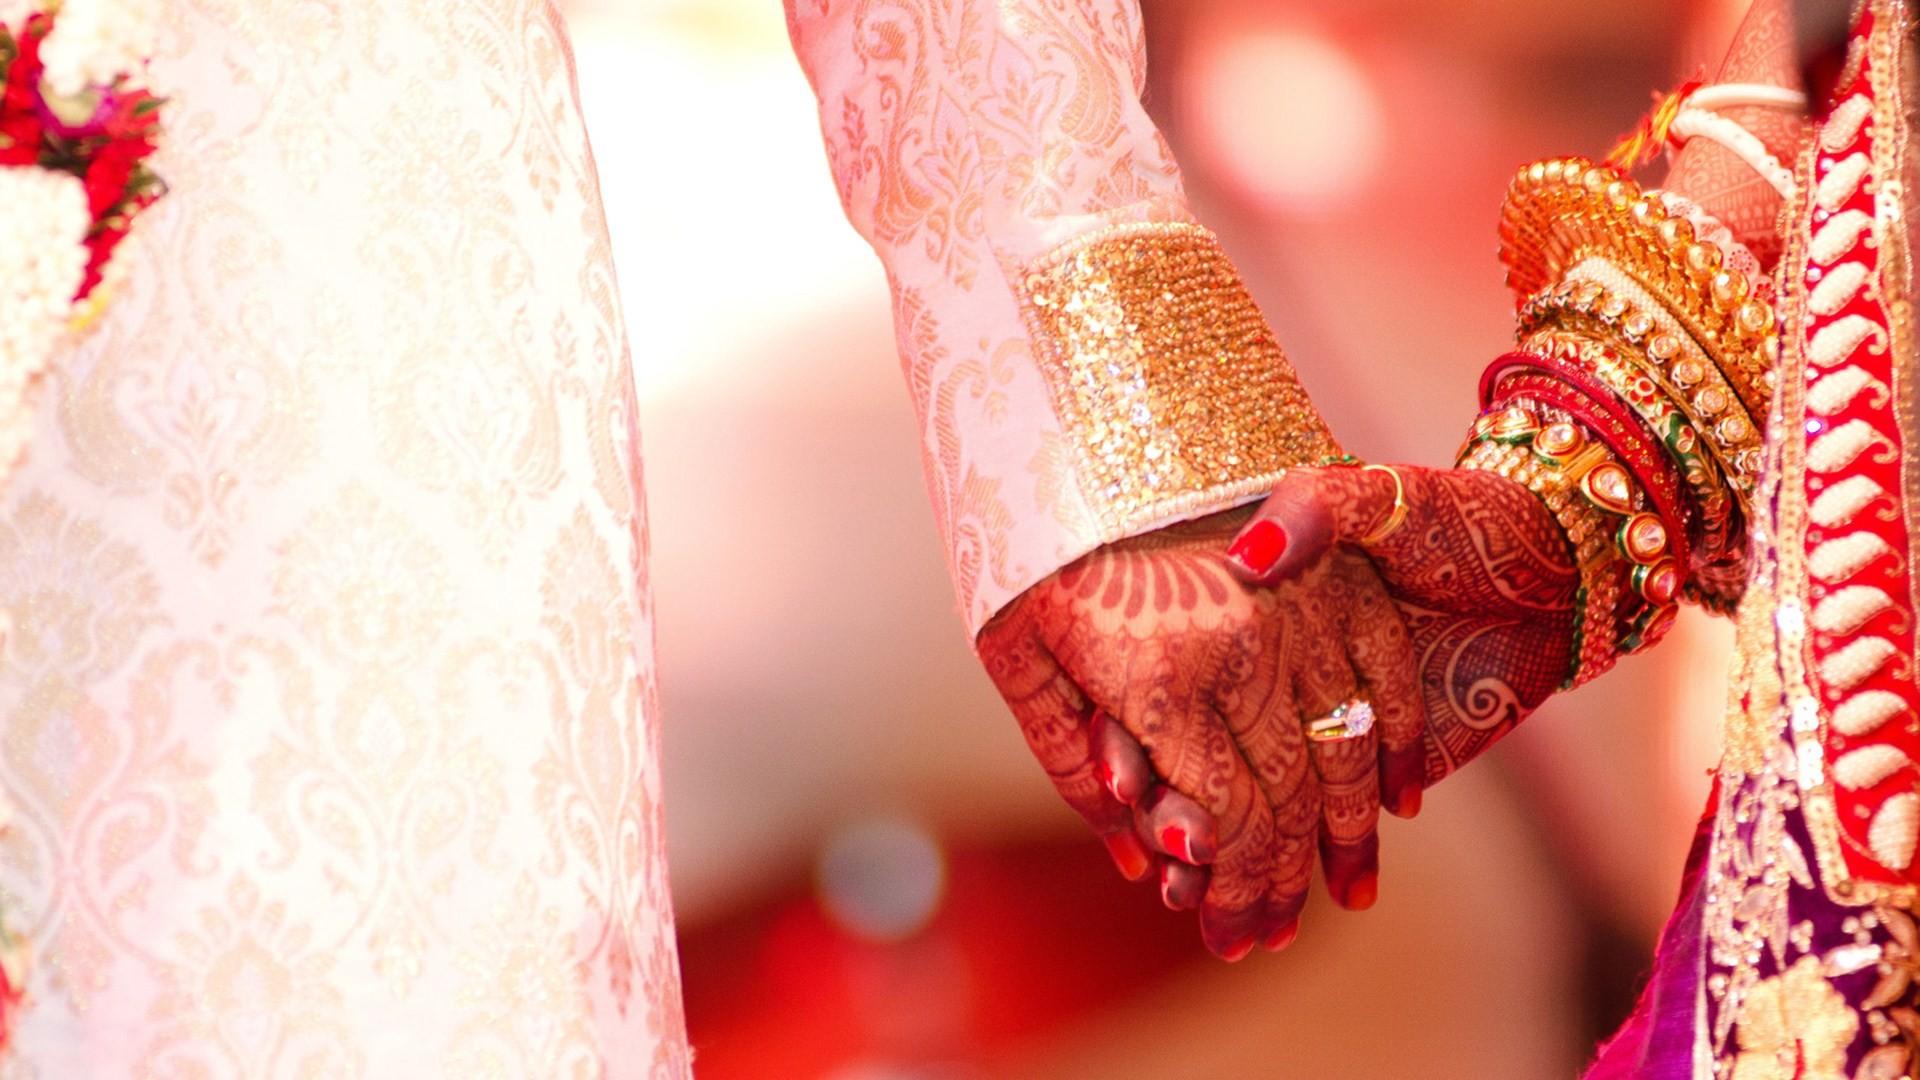 Wedding Wallpaper 64 Pictures